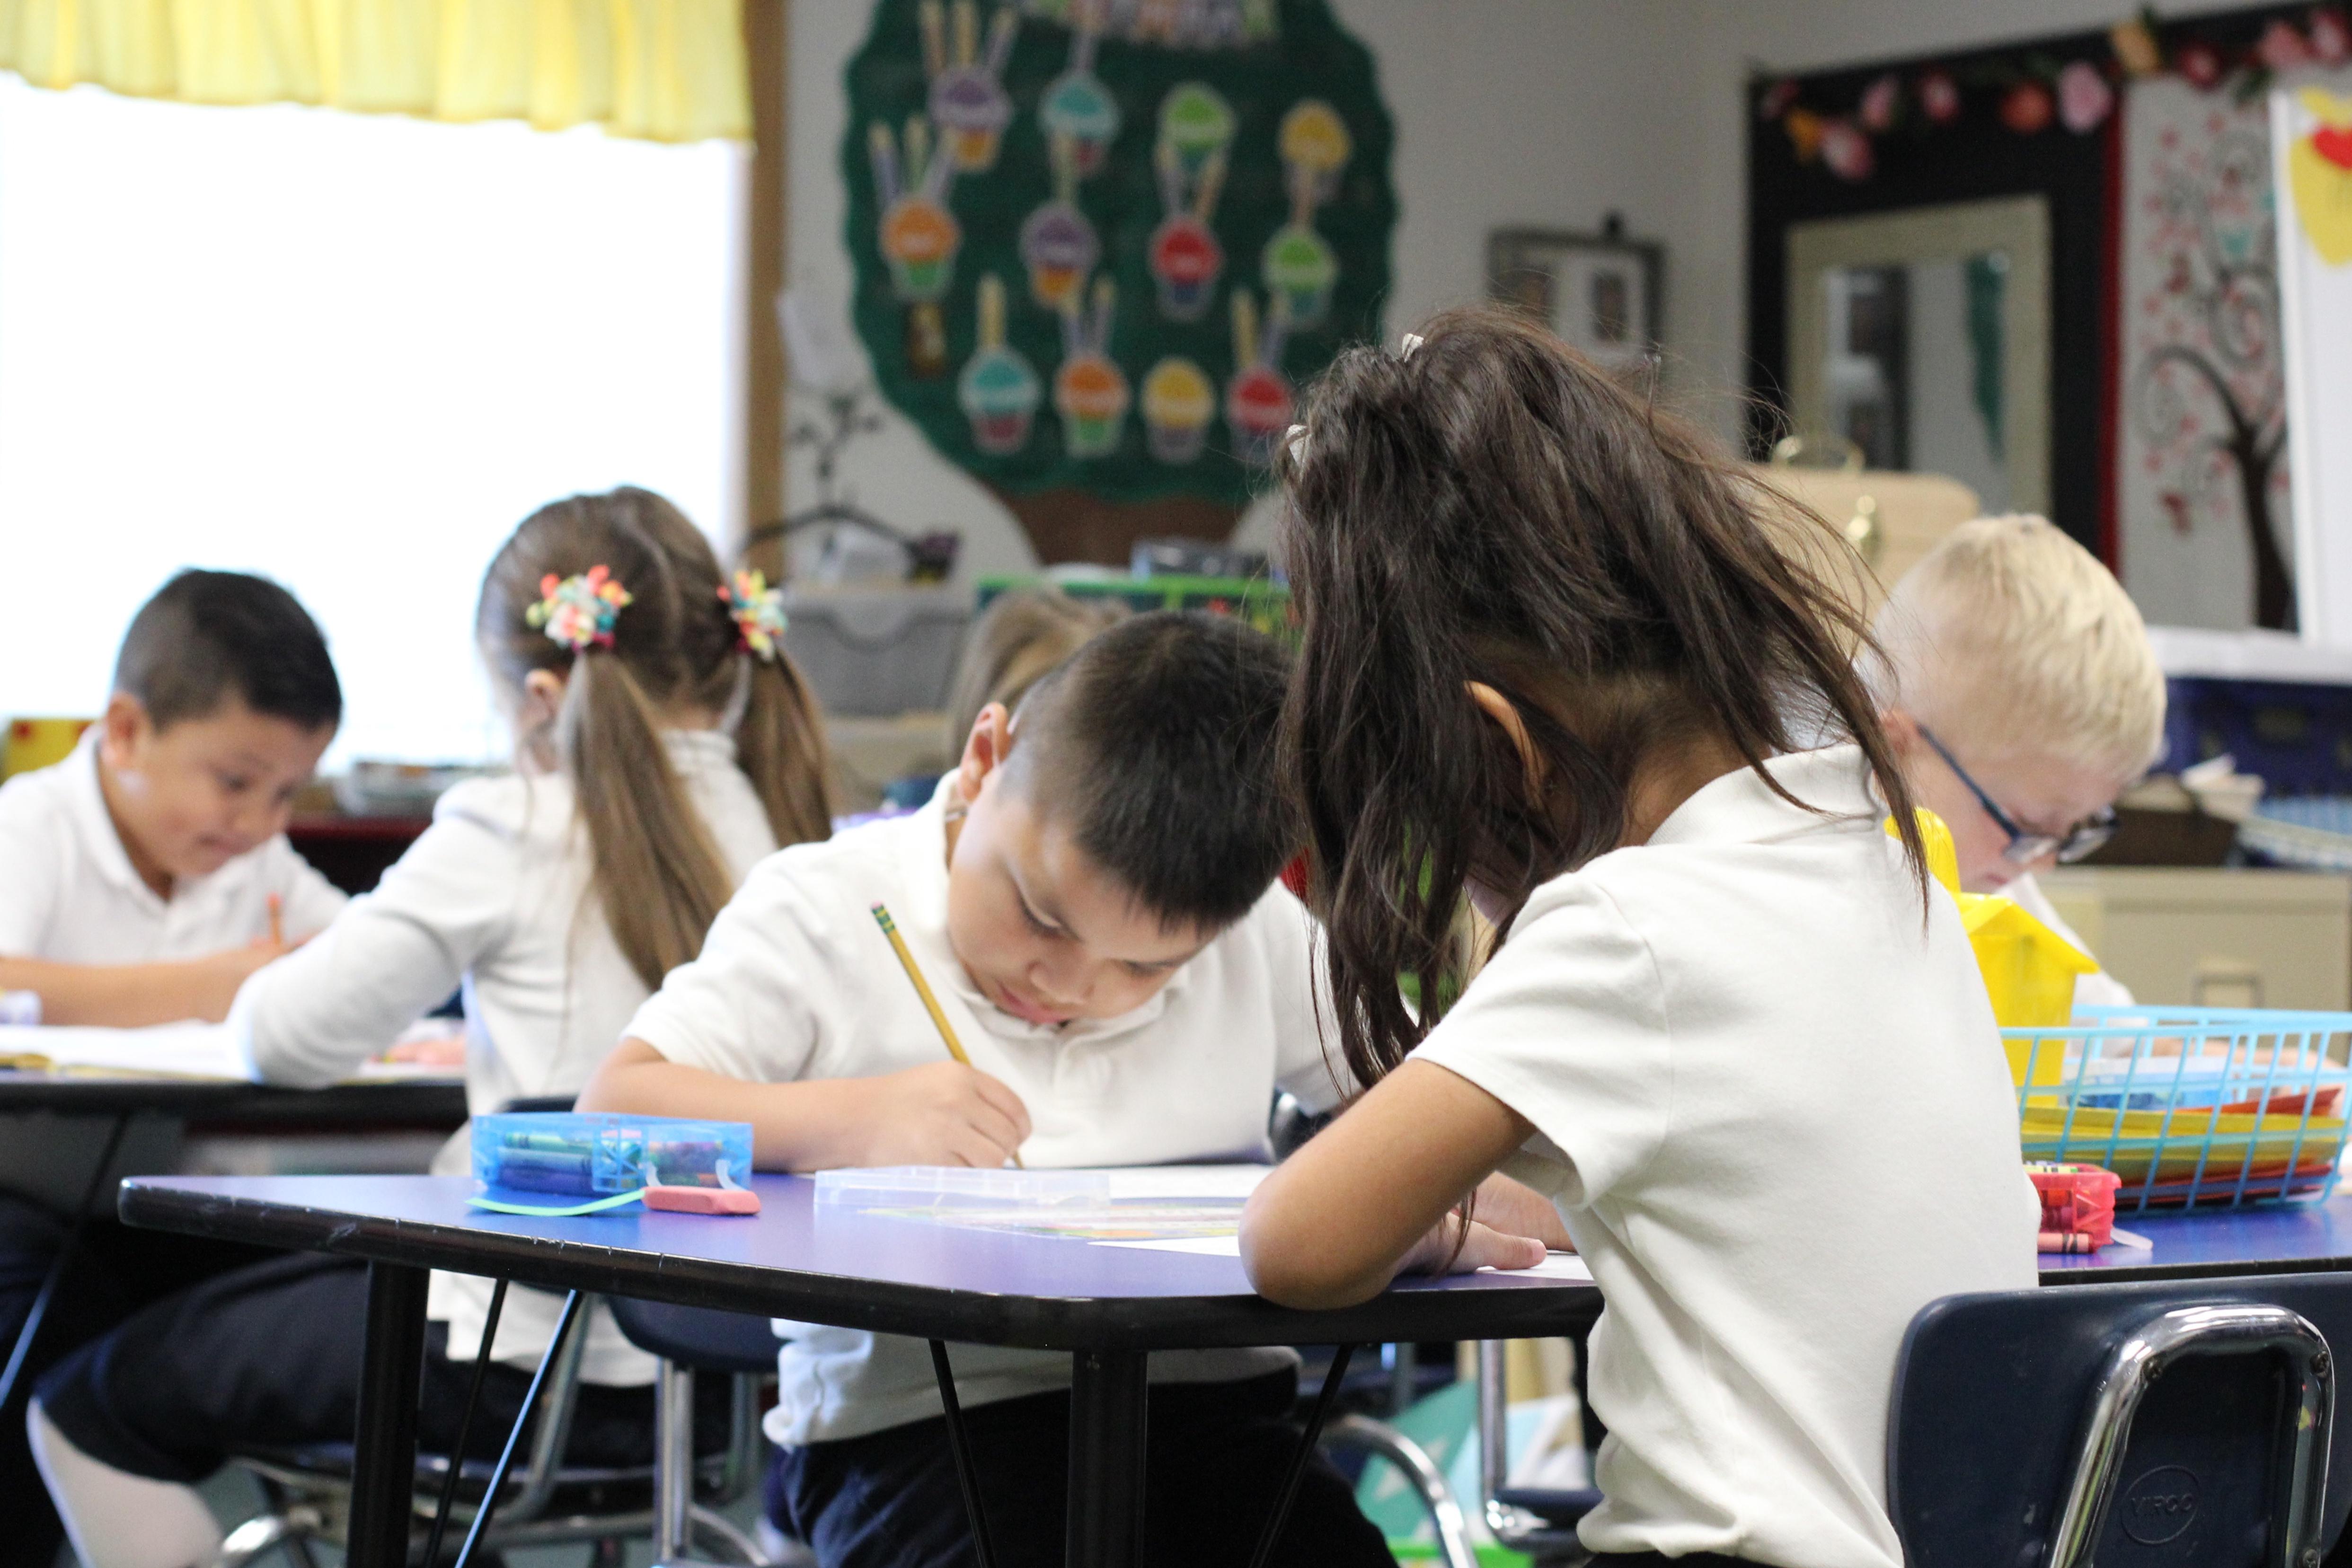 A Catholic School Room (Shutterstock/ Michelle Baumbach)